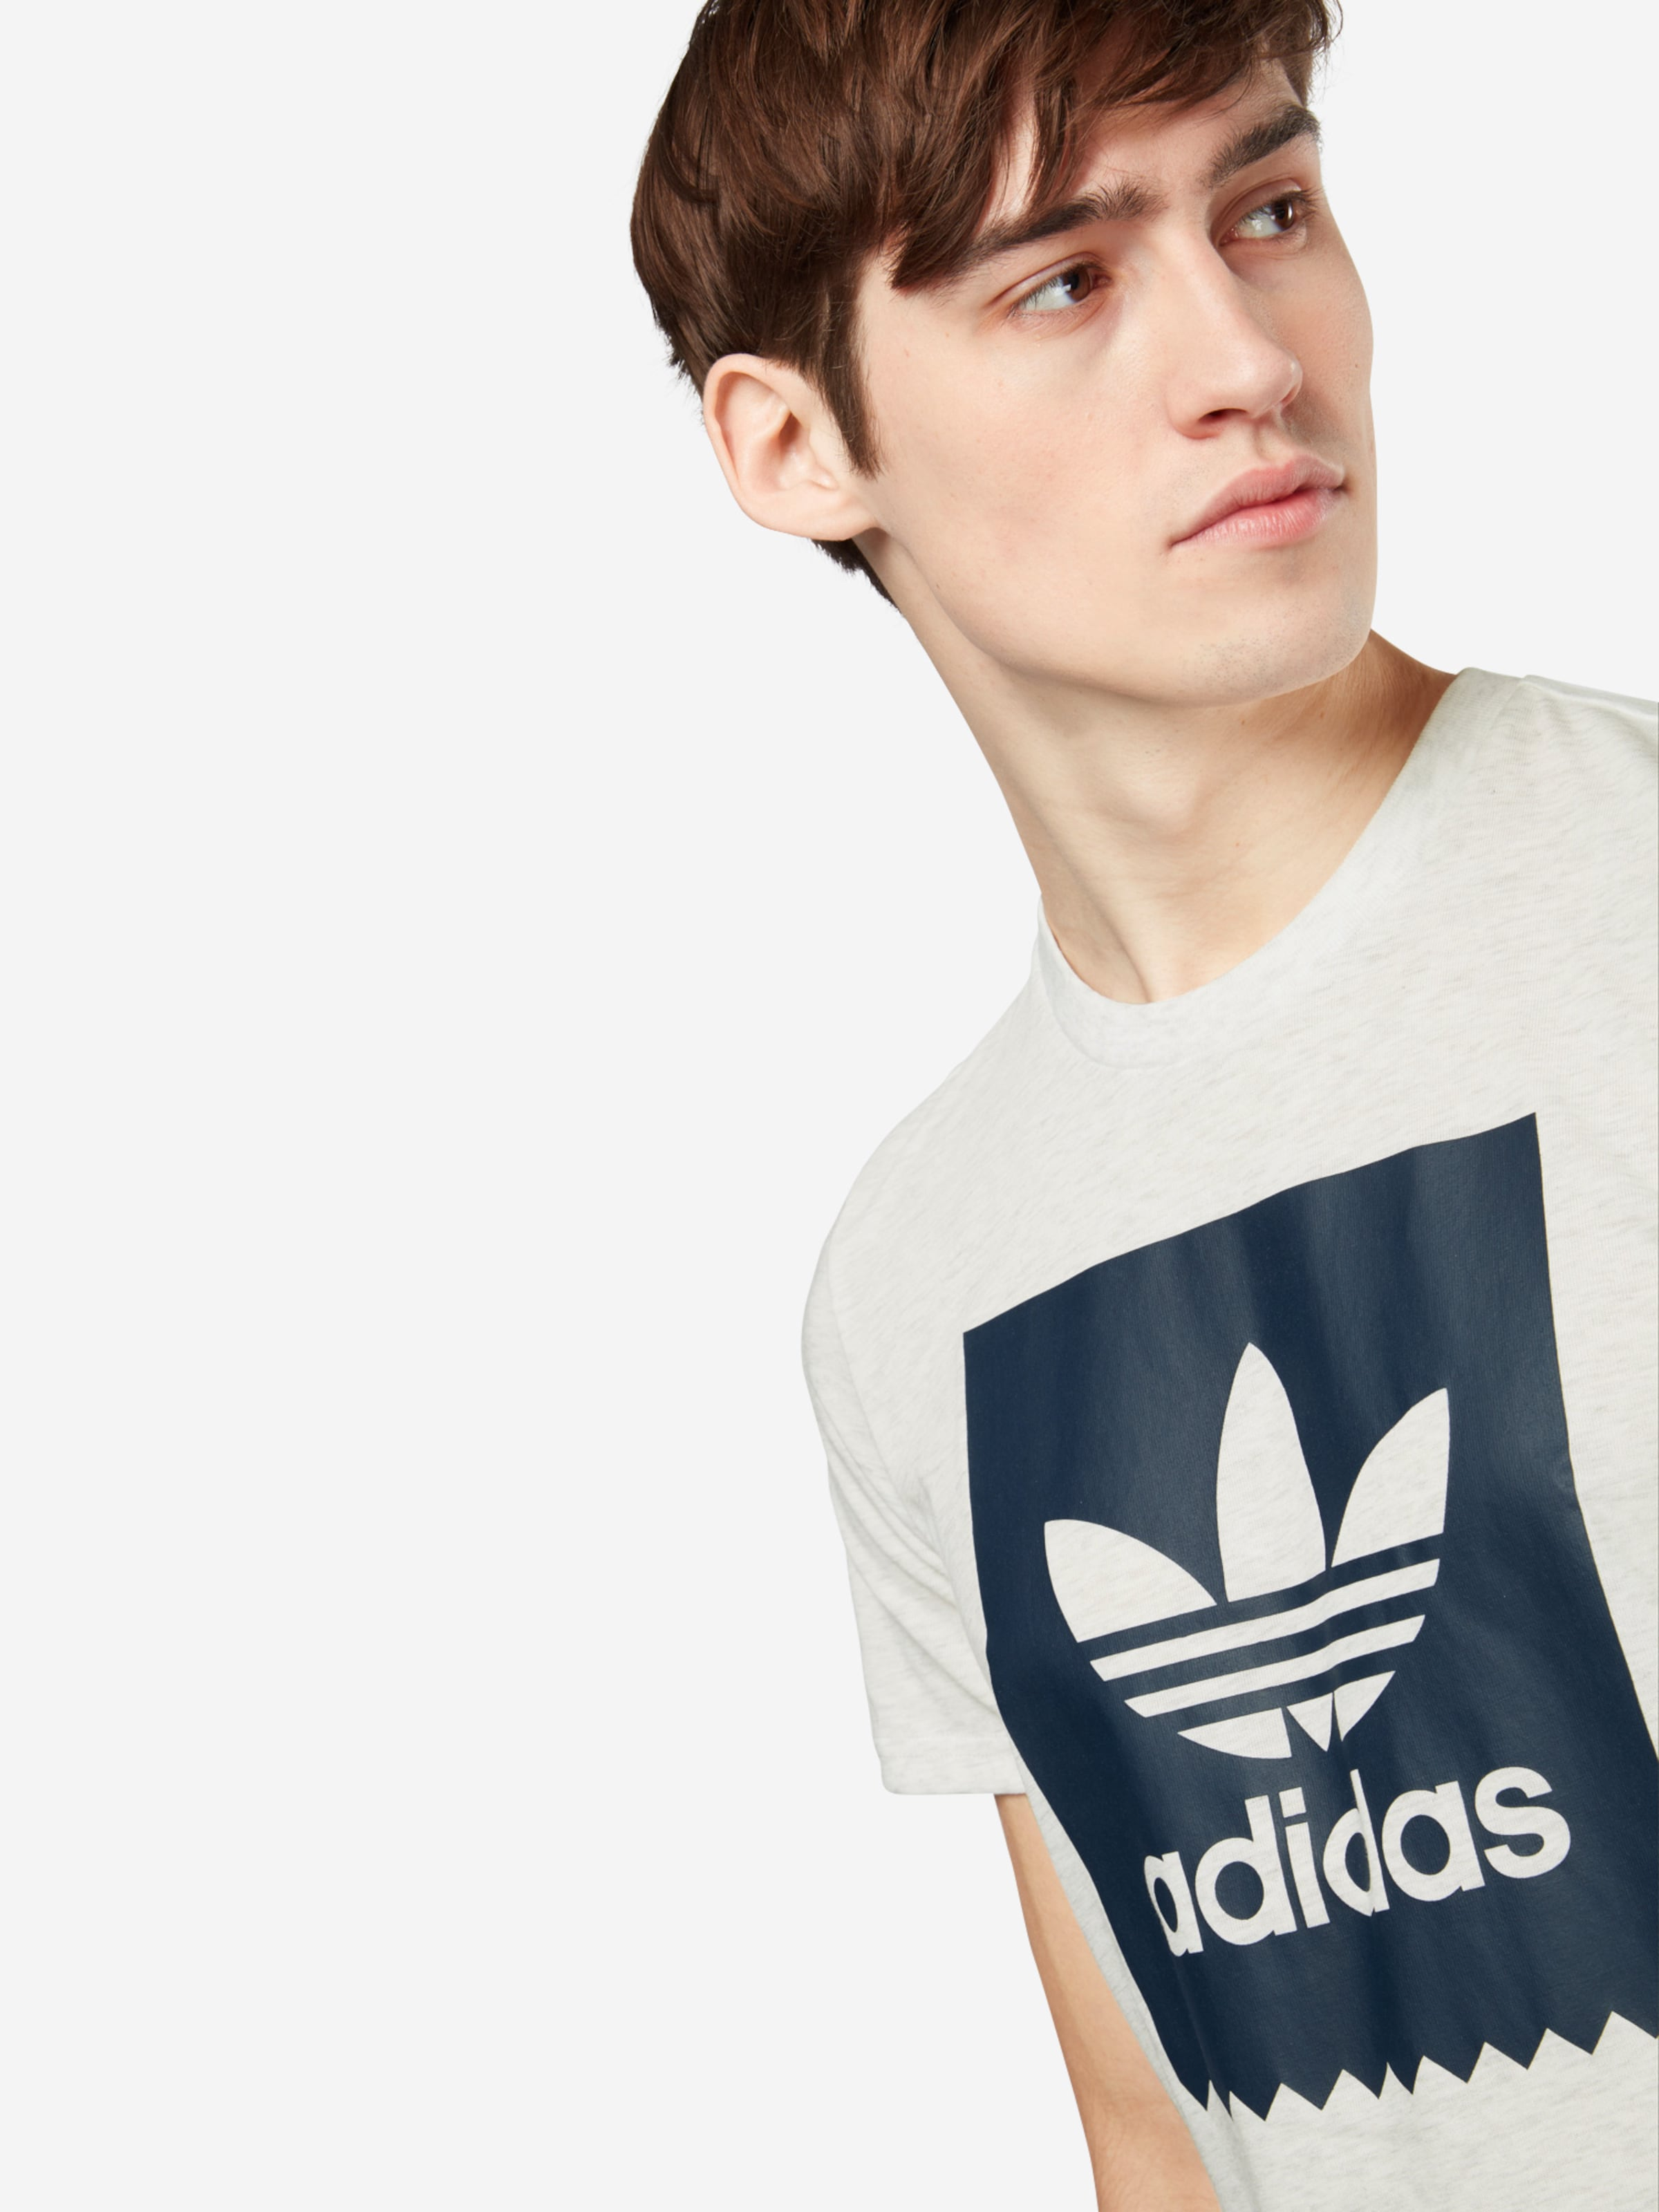 Rabatt Großhandel ADIDAS ORIGINALS T-Shirt 'SOLID BB T' Outlet-Store Steckdose Billigsten km4QaiGUu